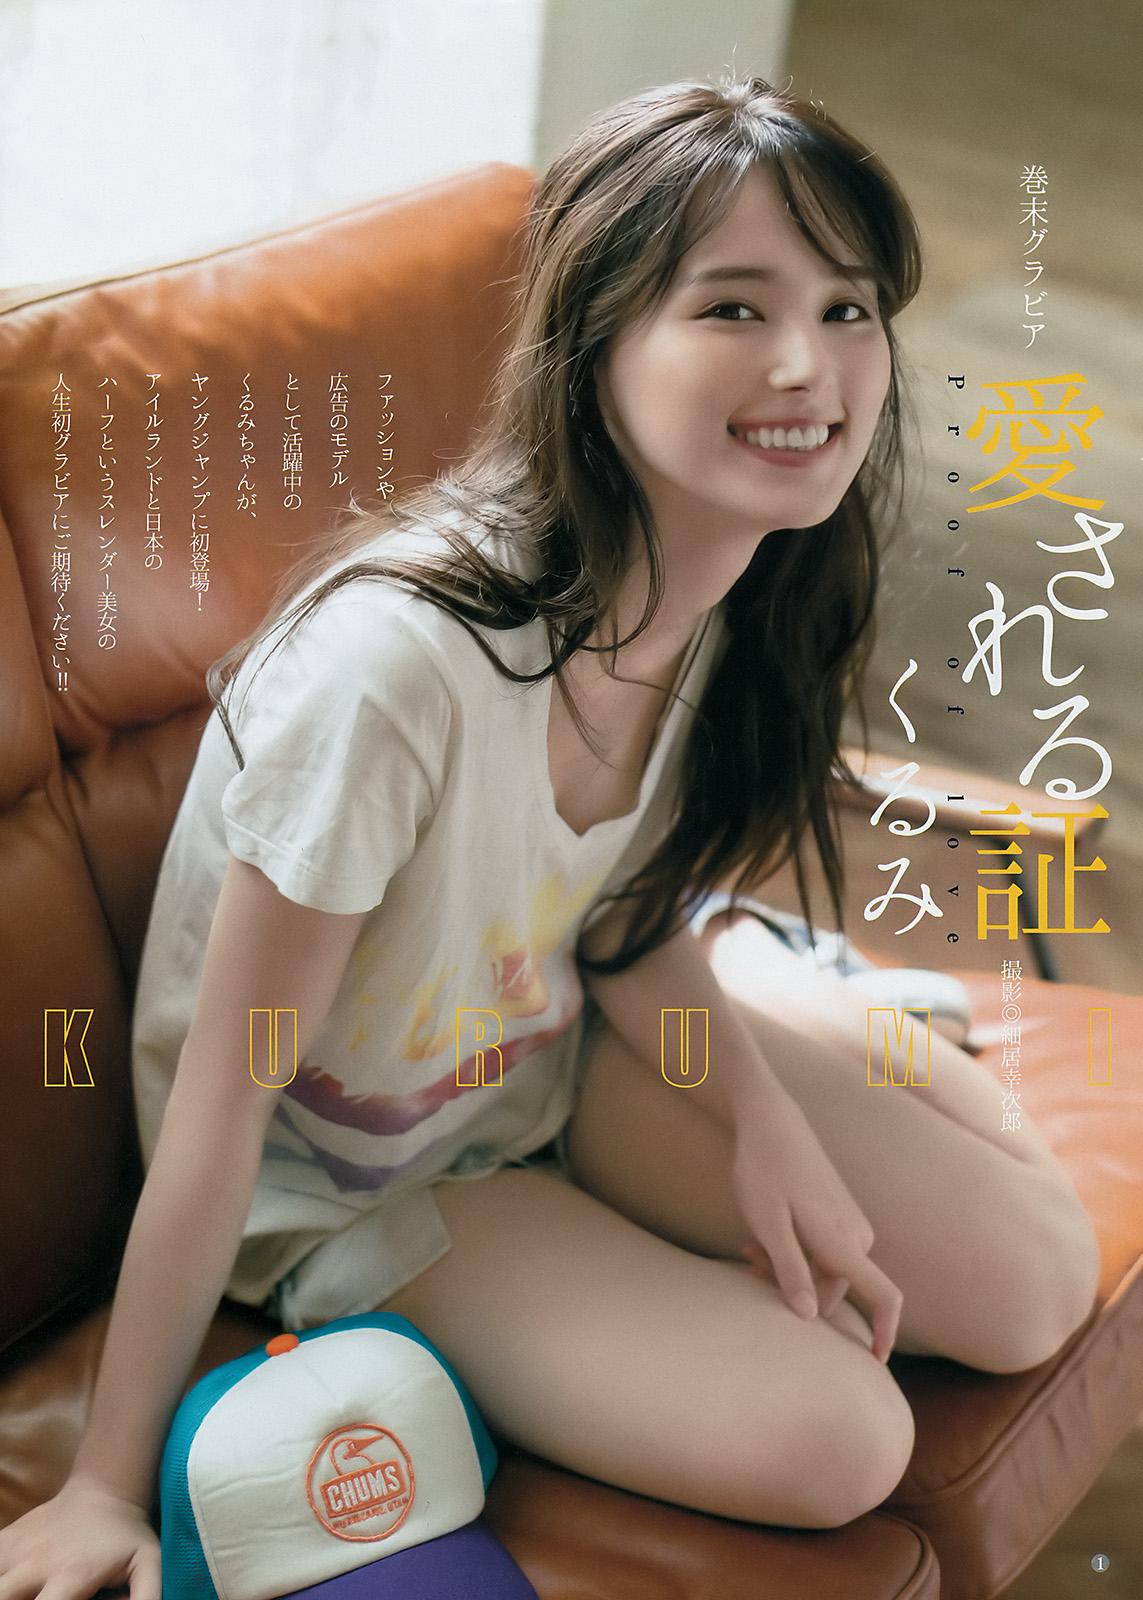 Kurumi Khan くるみかーん, Young Jump 2017 No.42 (週刊ヤングジャンプ 2017年42号)